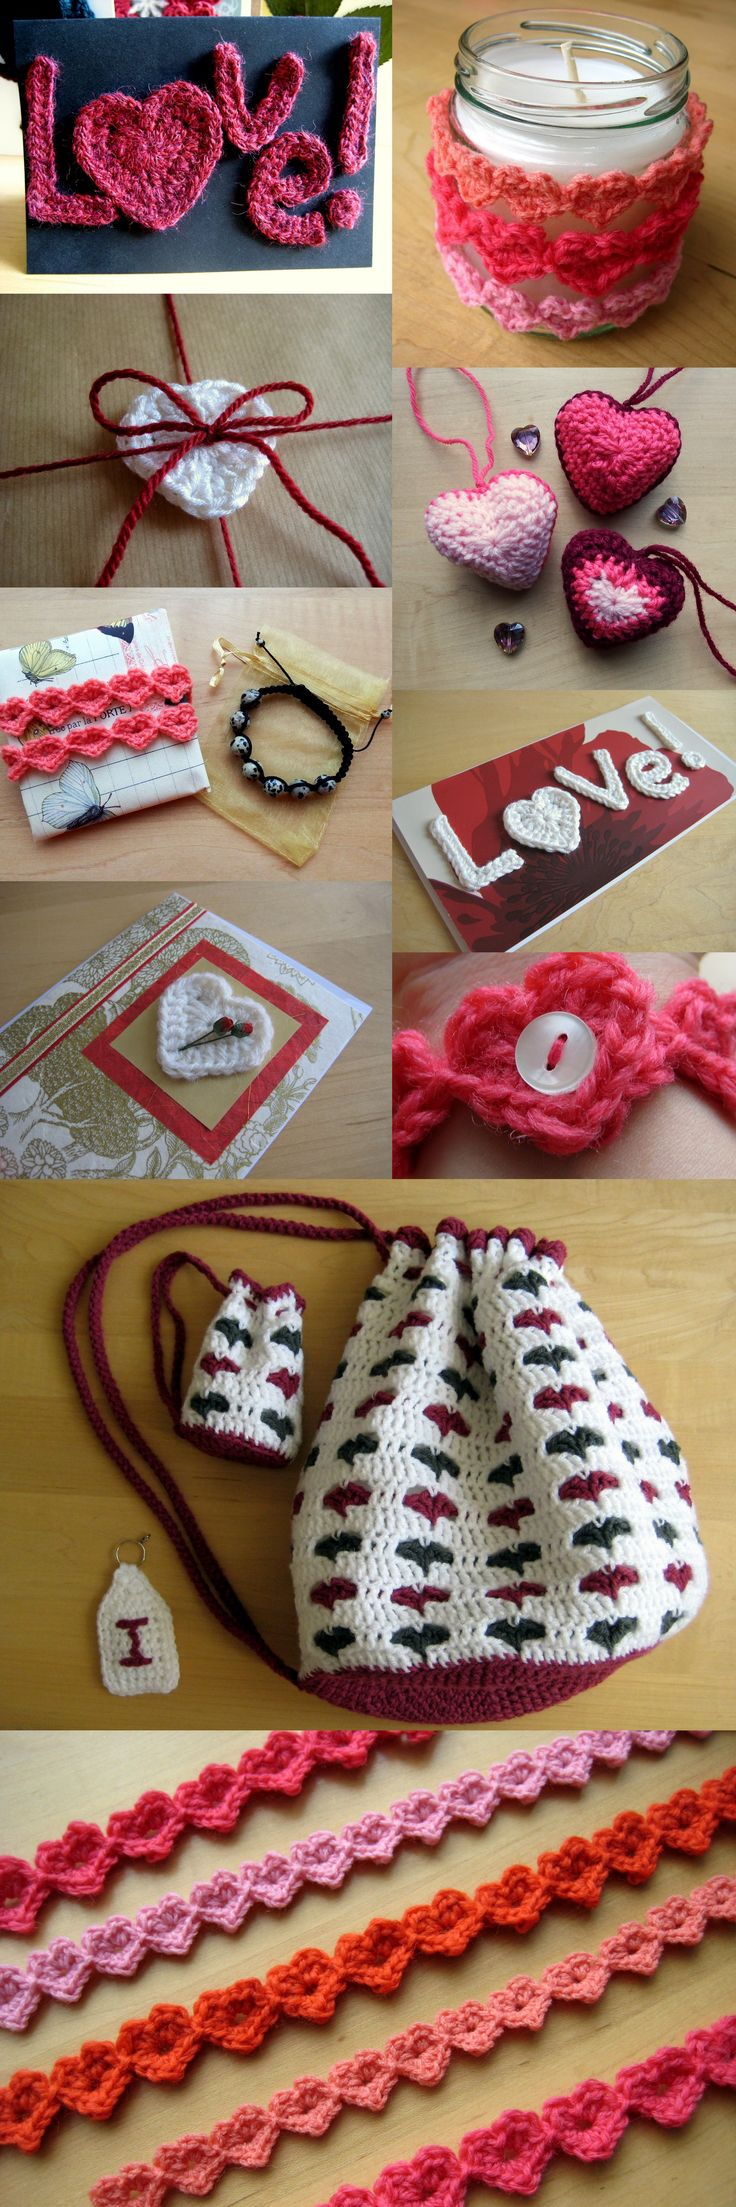 1496 best Crochet Motifs: Hearts + Non-Crochet Hearts images on ...